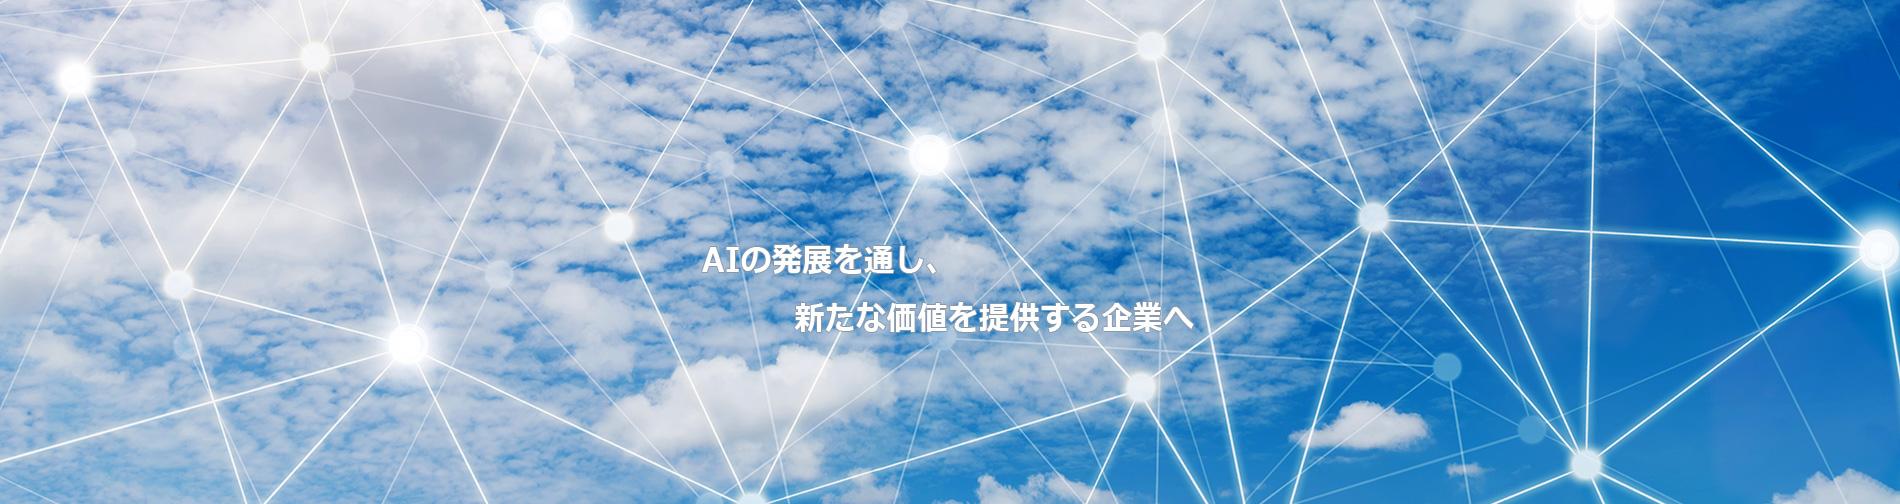 ANBISHIO TECHNOLOGY INC.